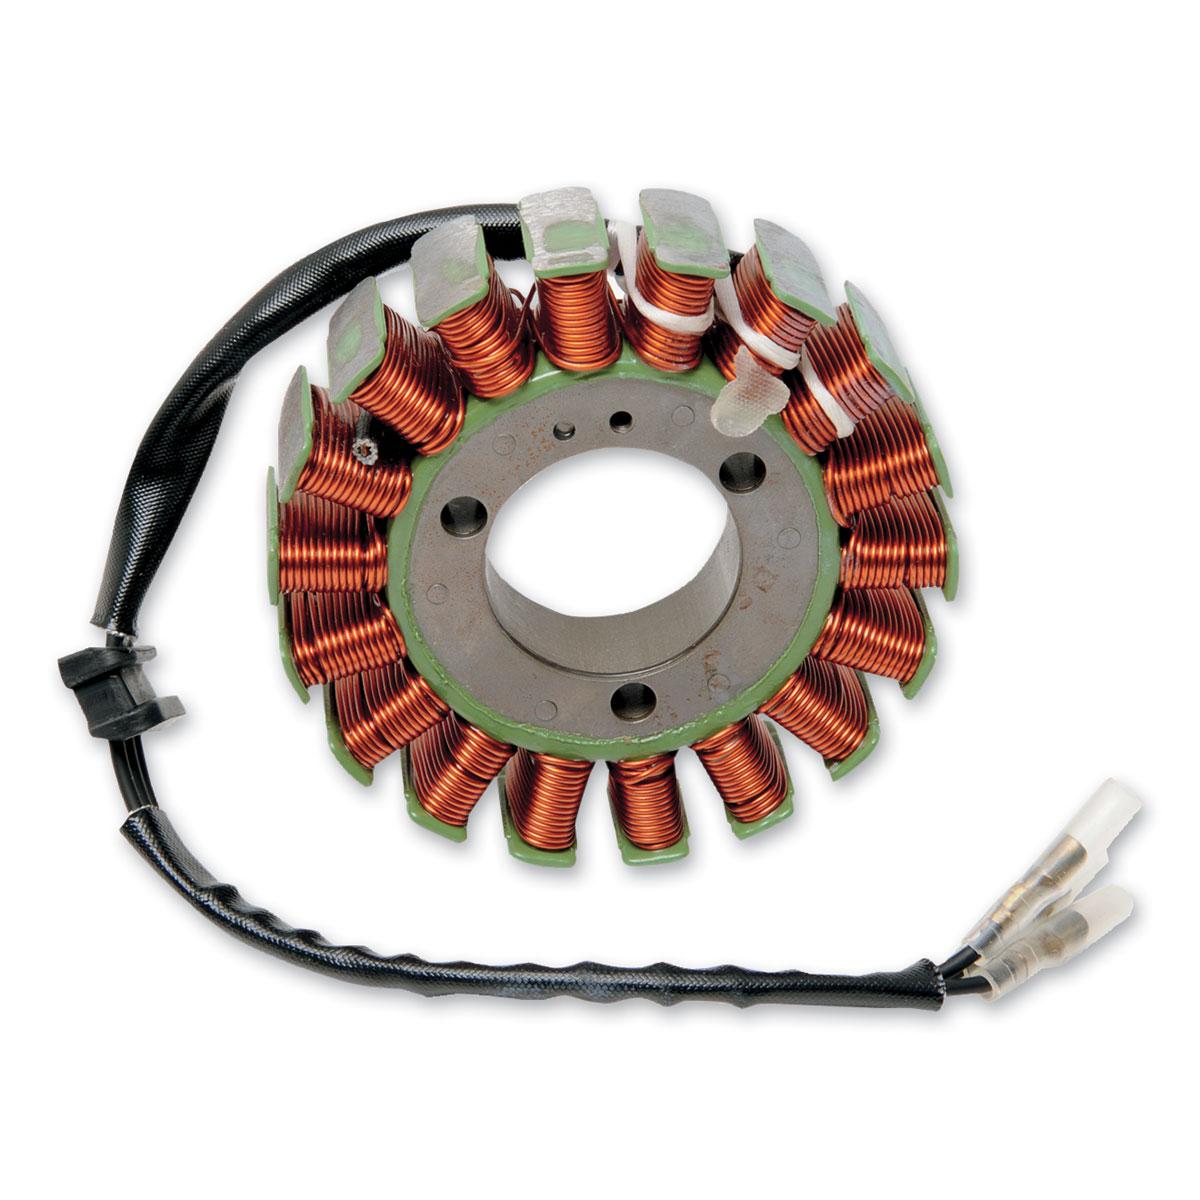 Rick's Motorsport Electrics, Inc. Stator